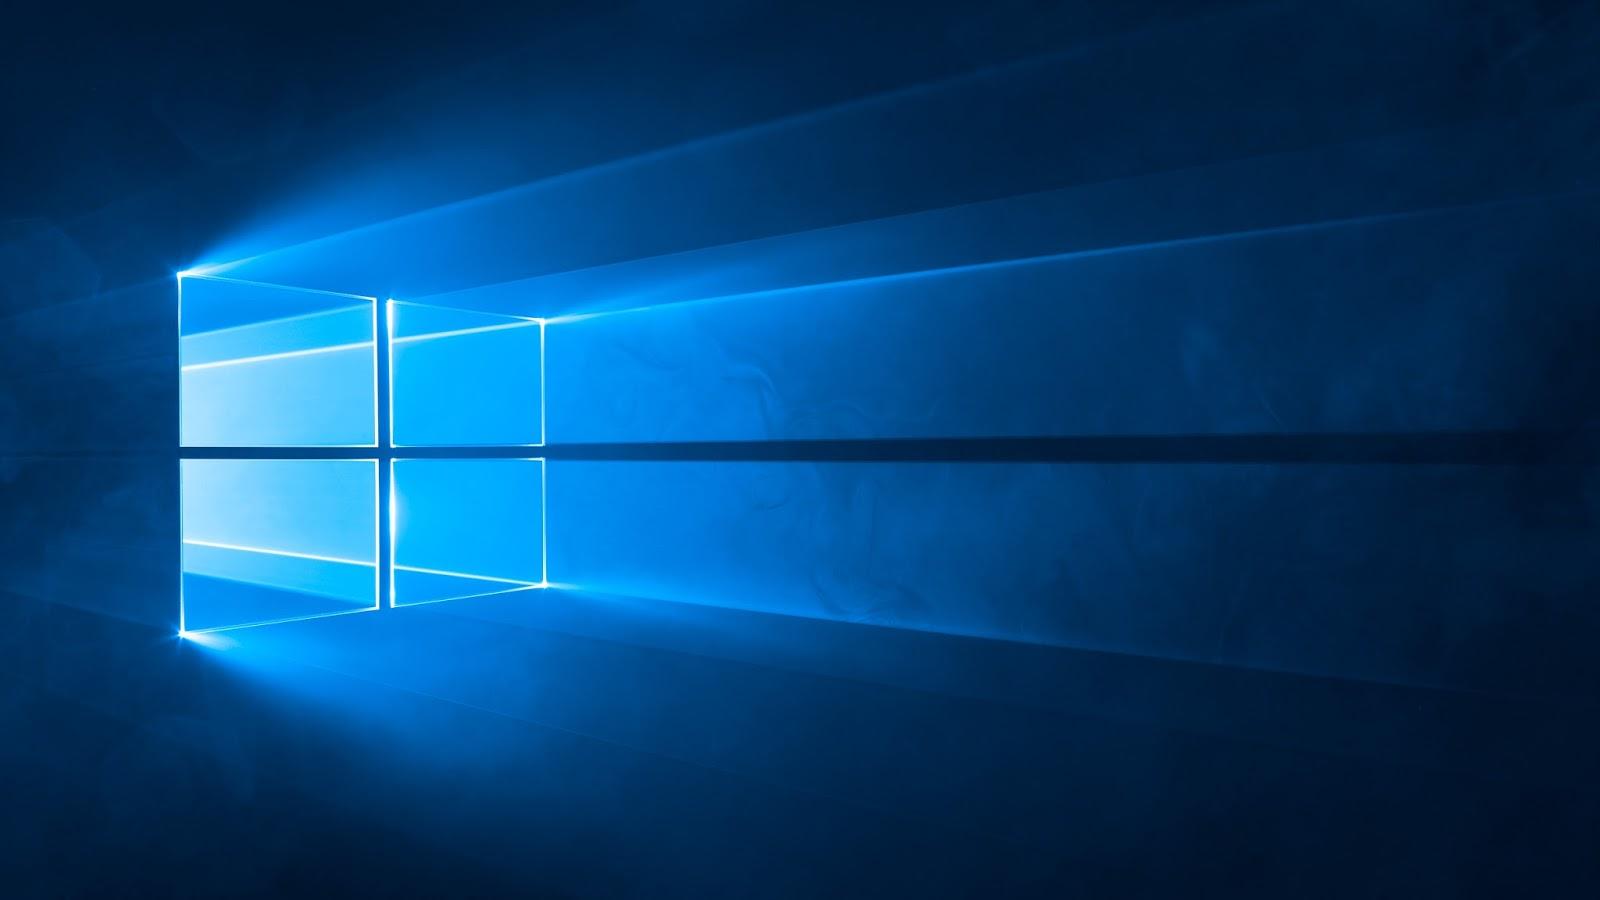 HD Desktop Wallpapers Windows 10